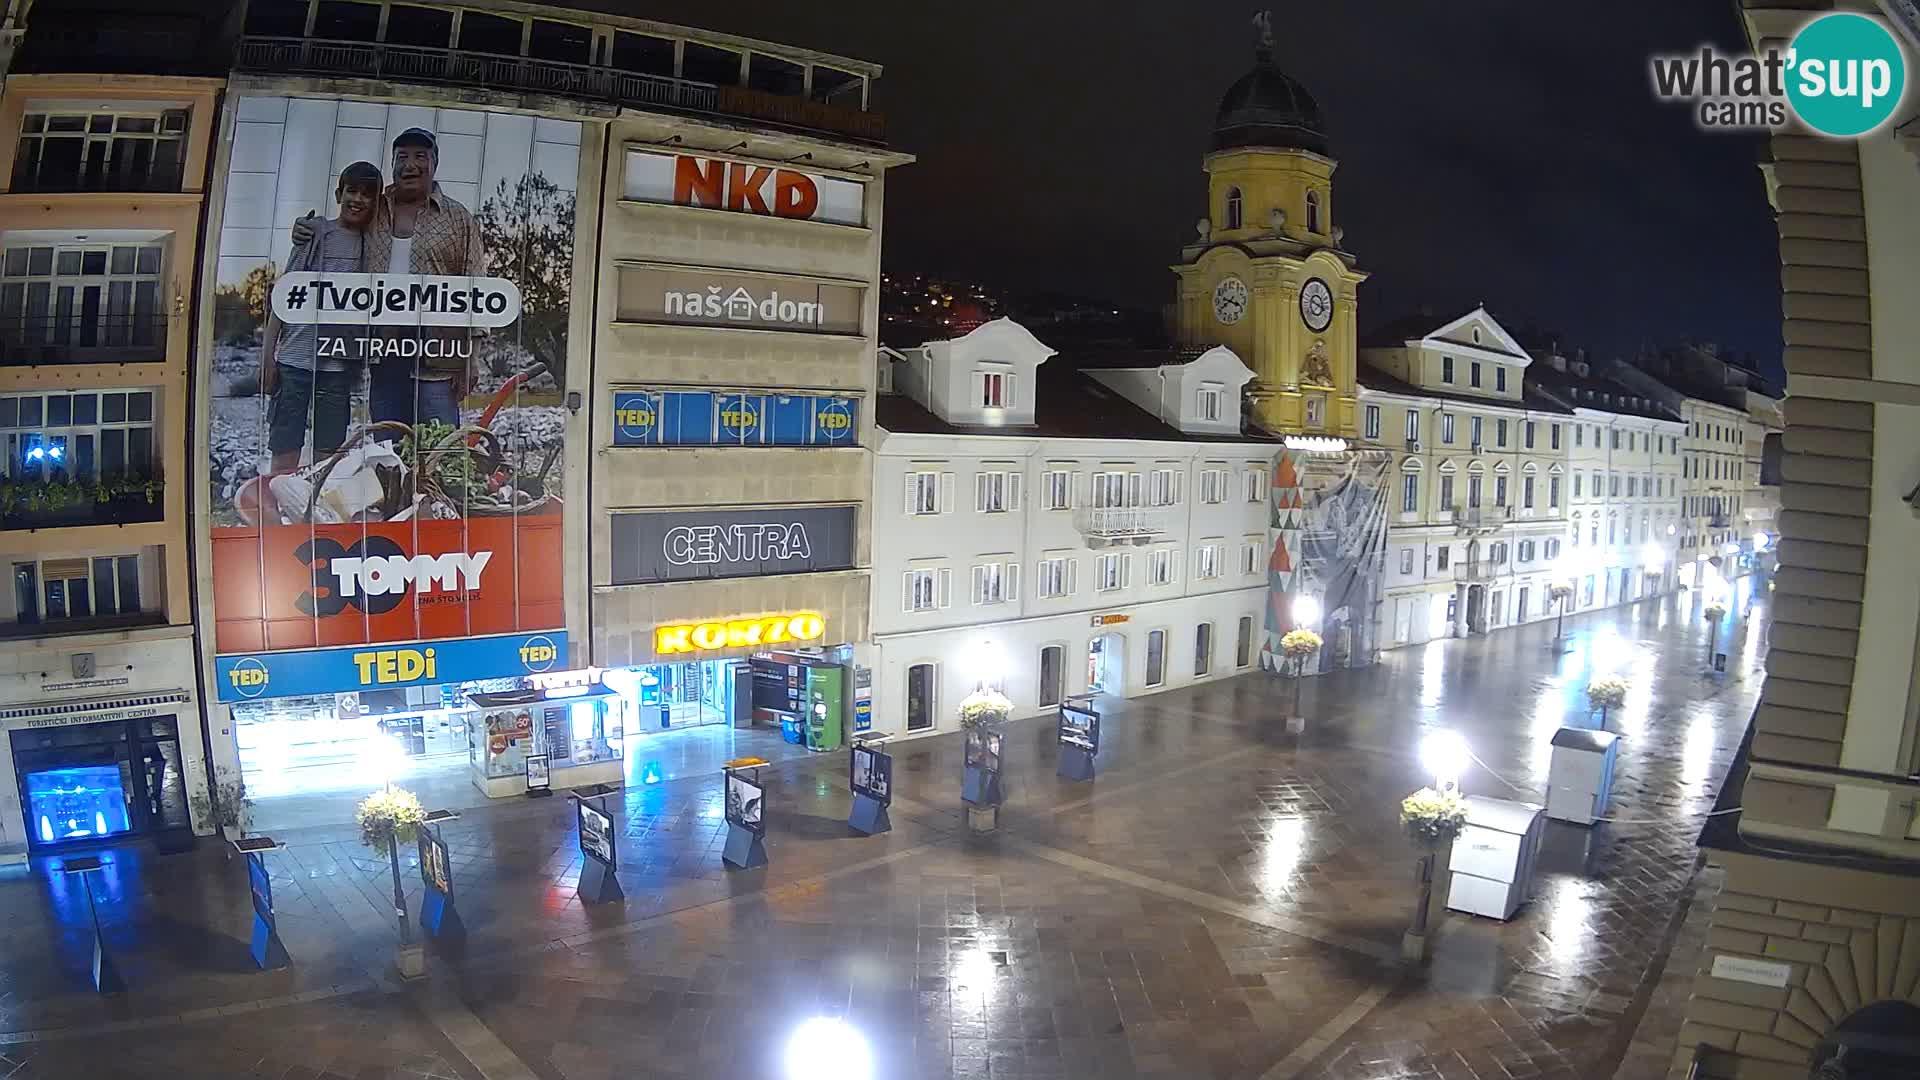 Rijeka – City Tower and Clock